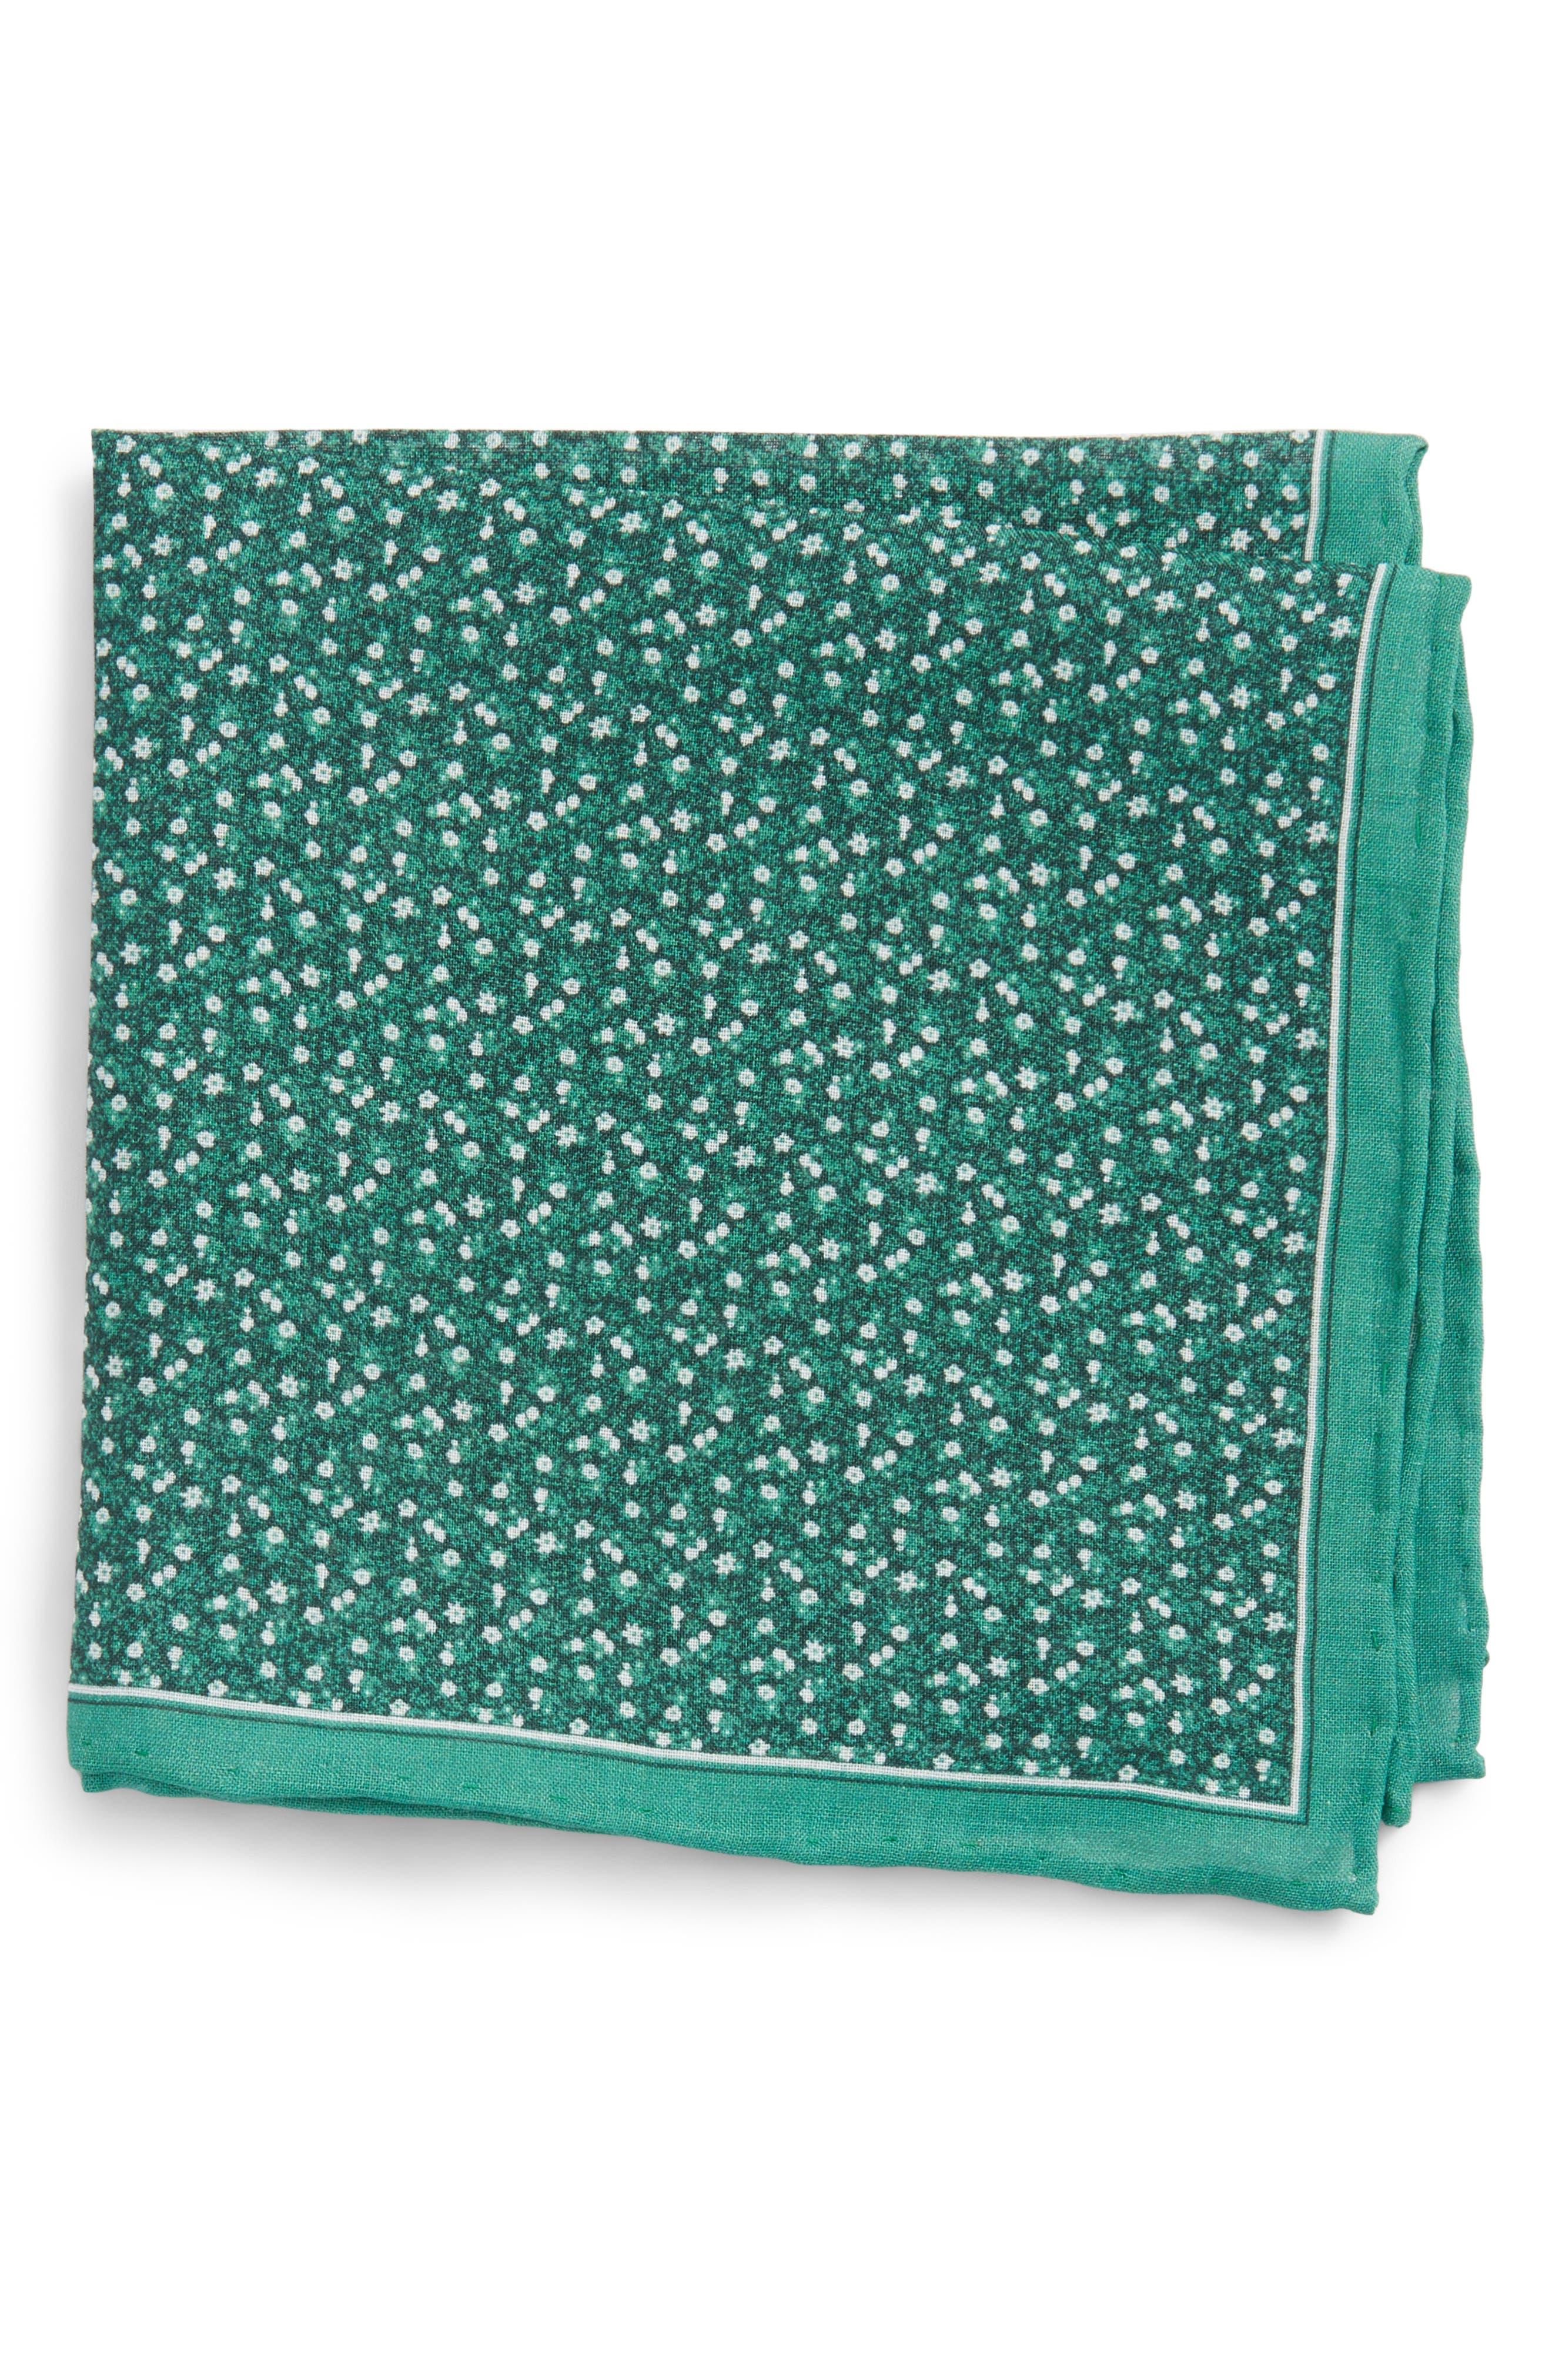 Alternate Image 1 Selected - The Tie Bar Floral Mark Linen Pocket Square